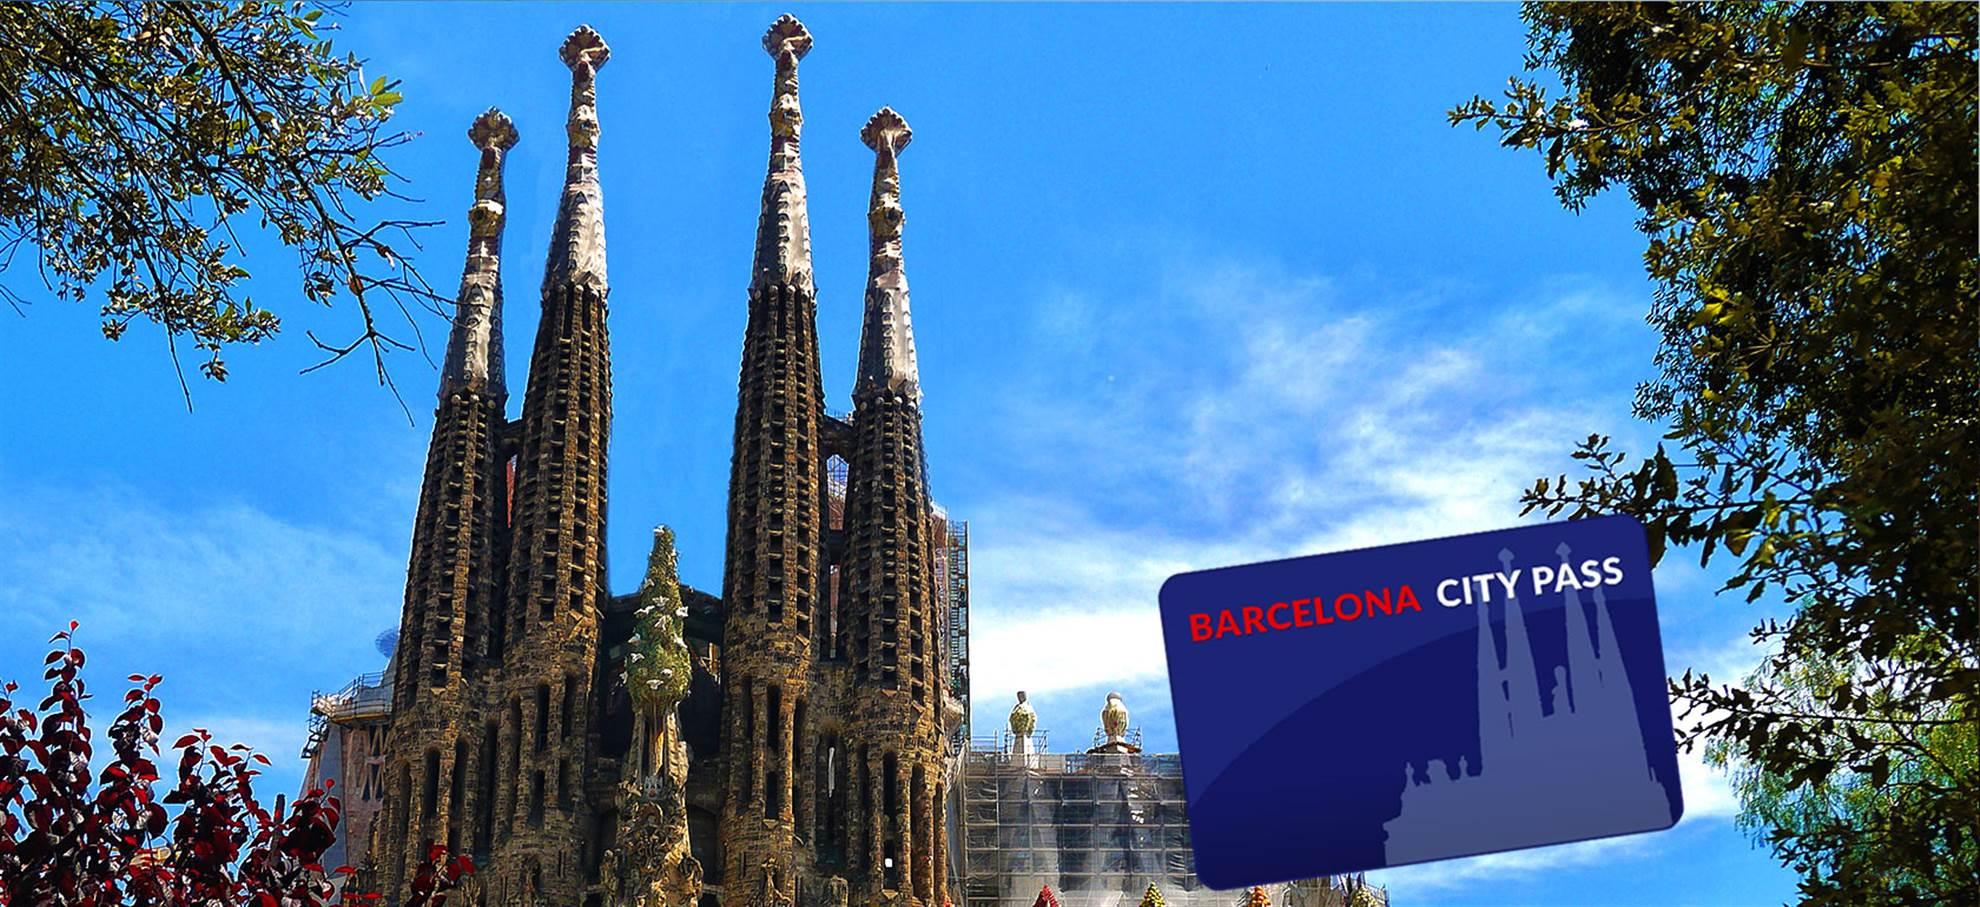 Барселона City Pass (Cаграда Фамилия с Аудиогидом и посещение Башни)